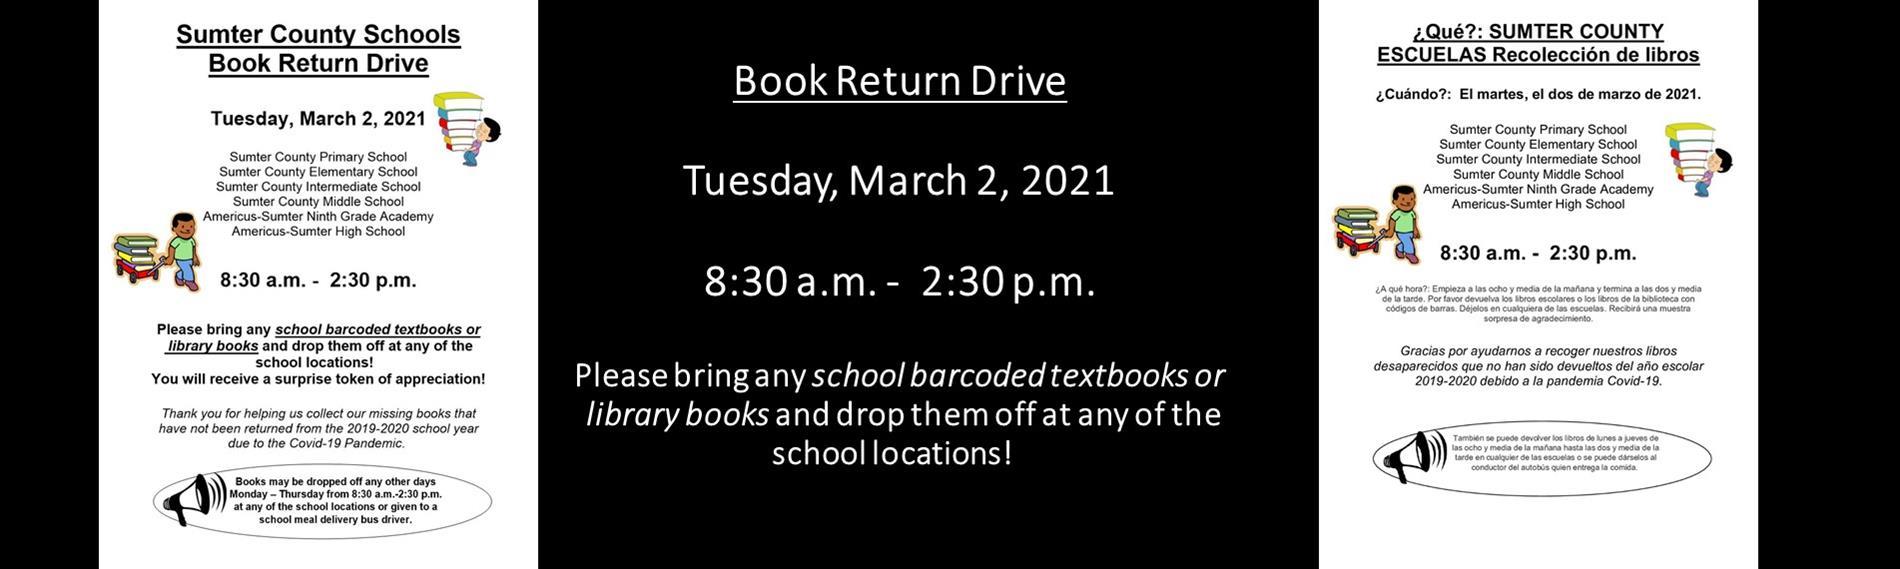 Book Return Drive